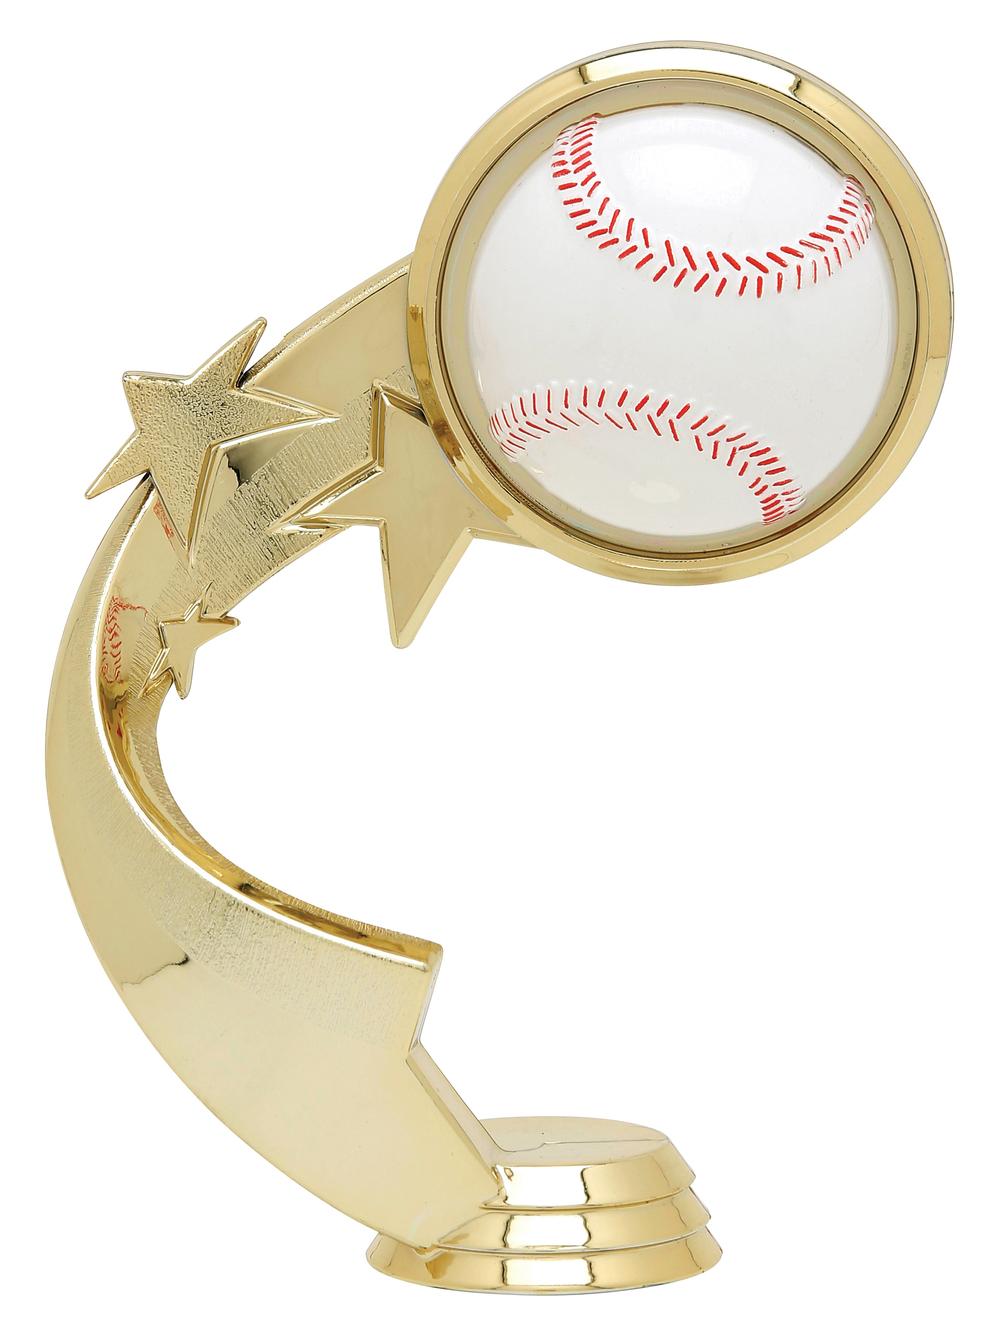 "Ribbon Star Baseball 5503-G - 5.25"" tall"